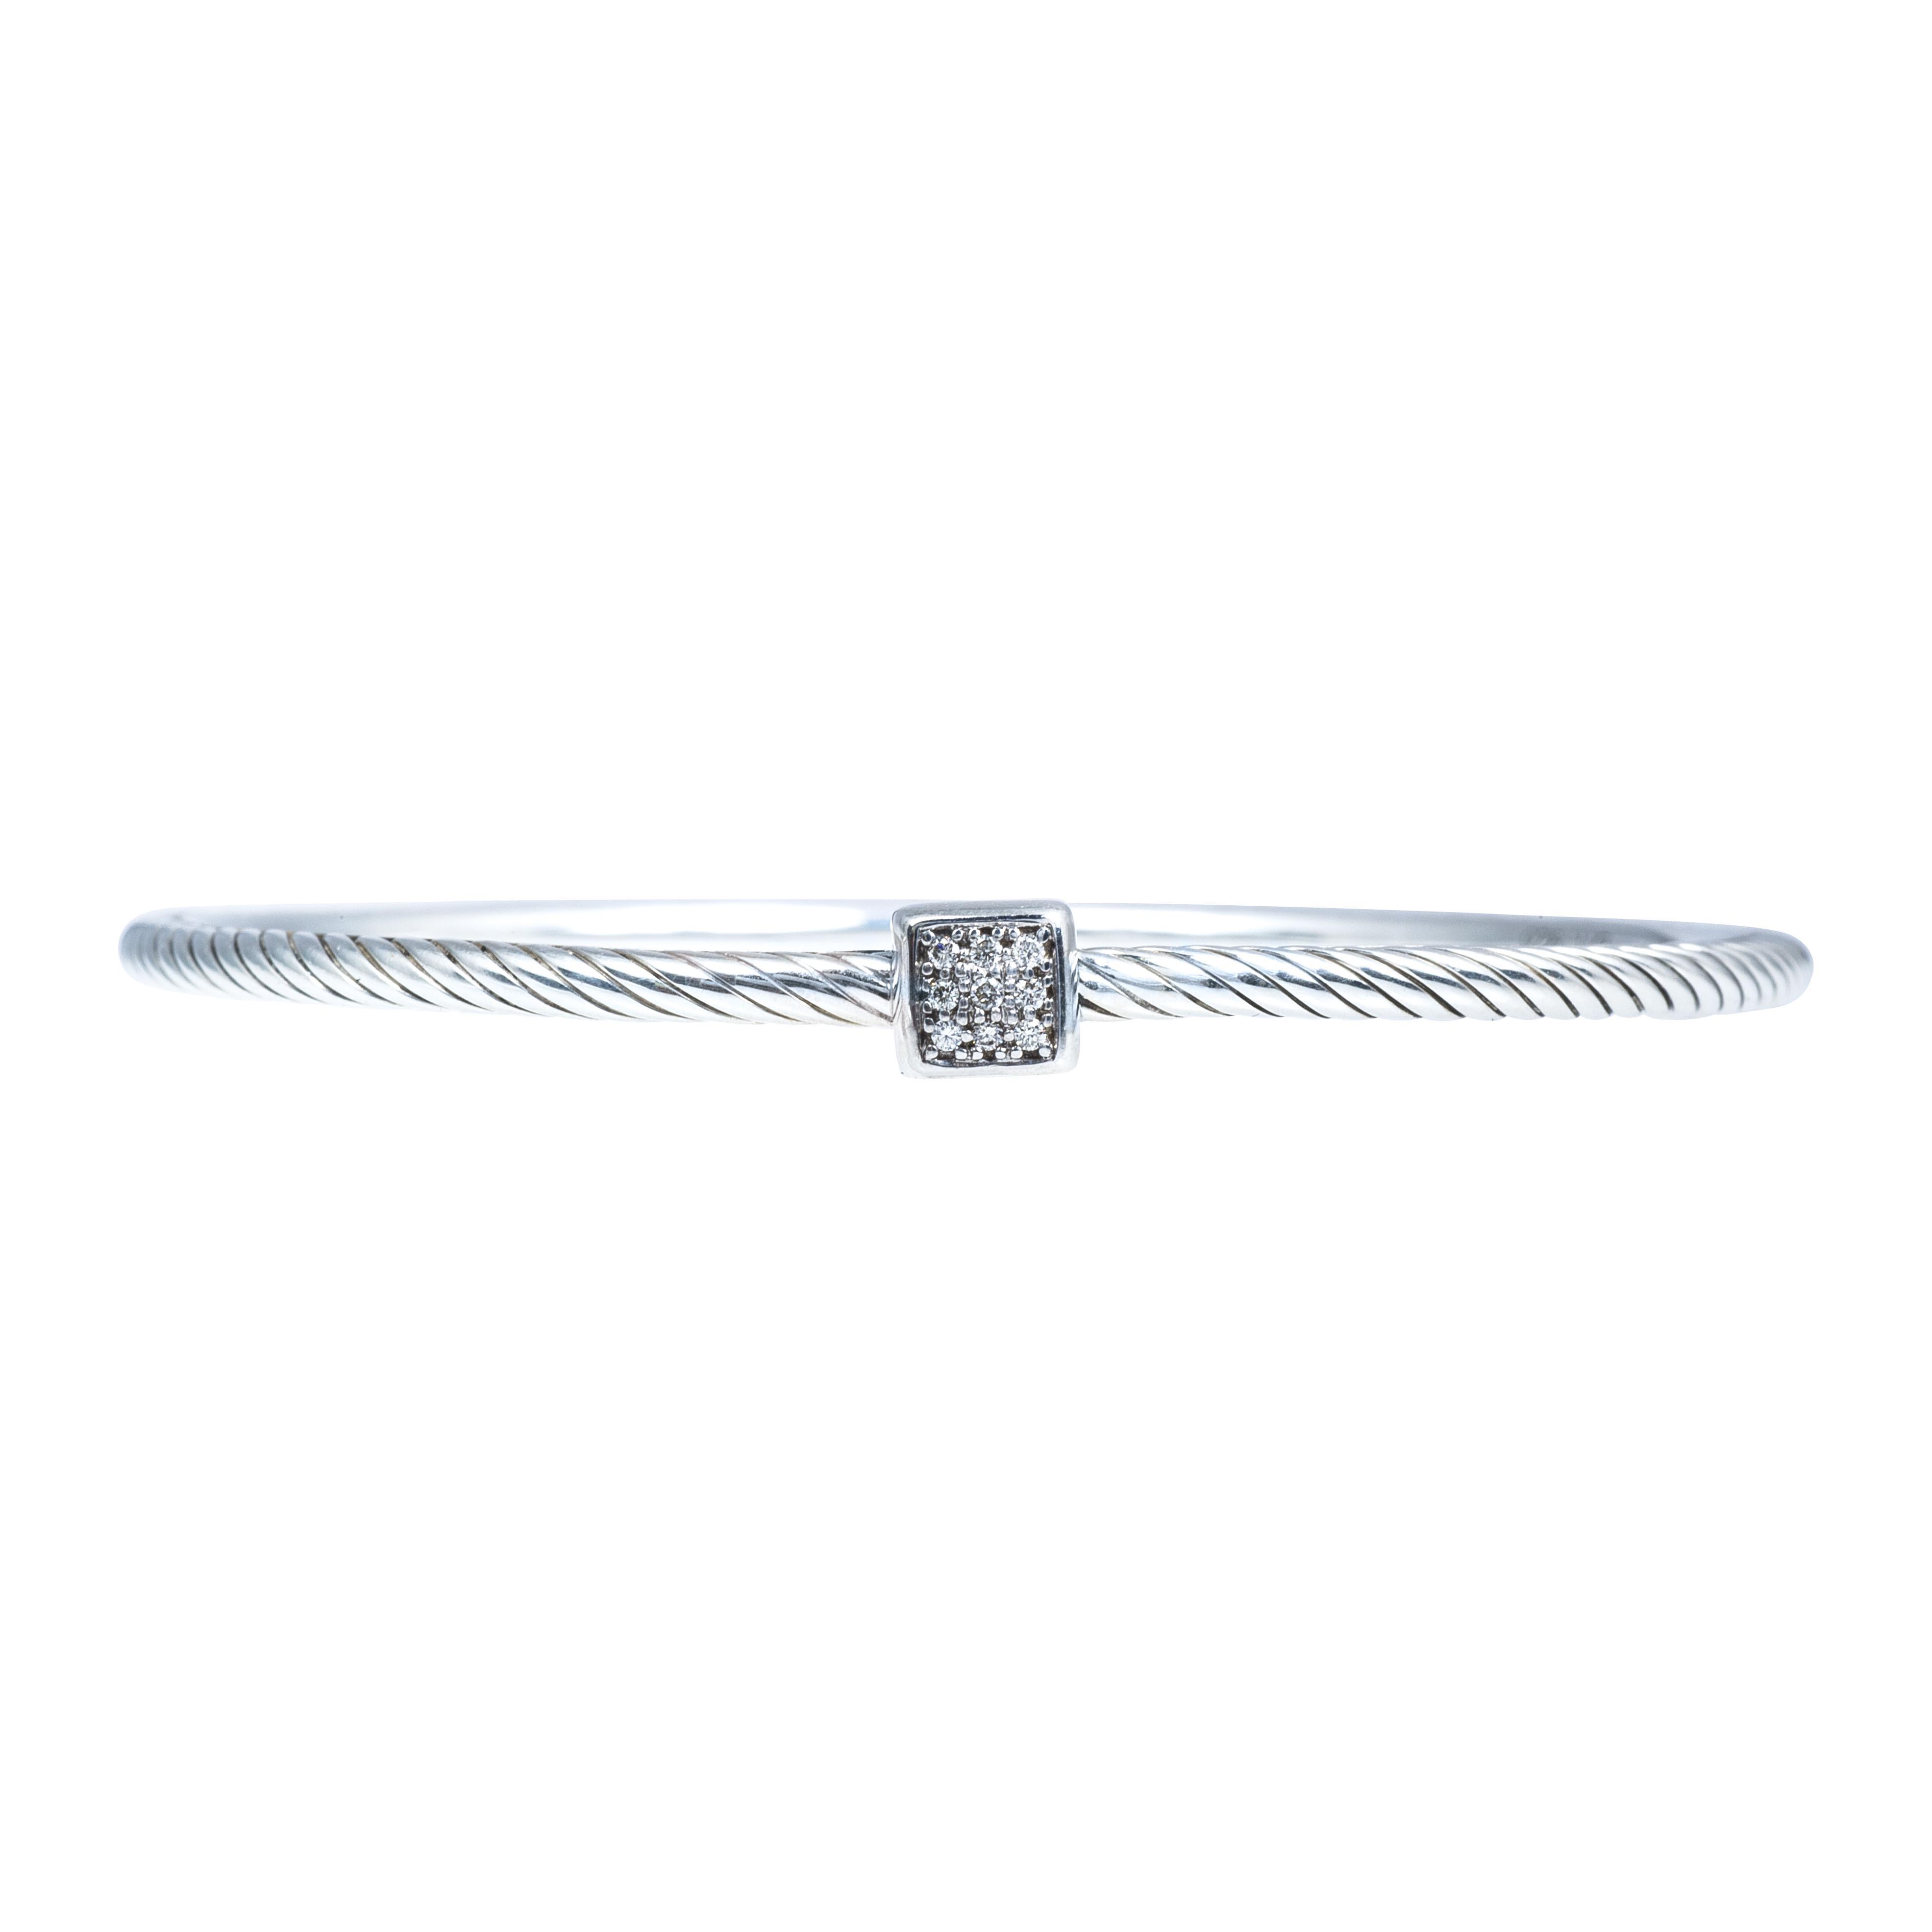 Vintage David Yurman 0.06 CTW Diamond Confetti Bangle